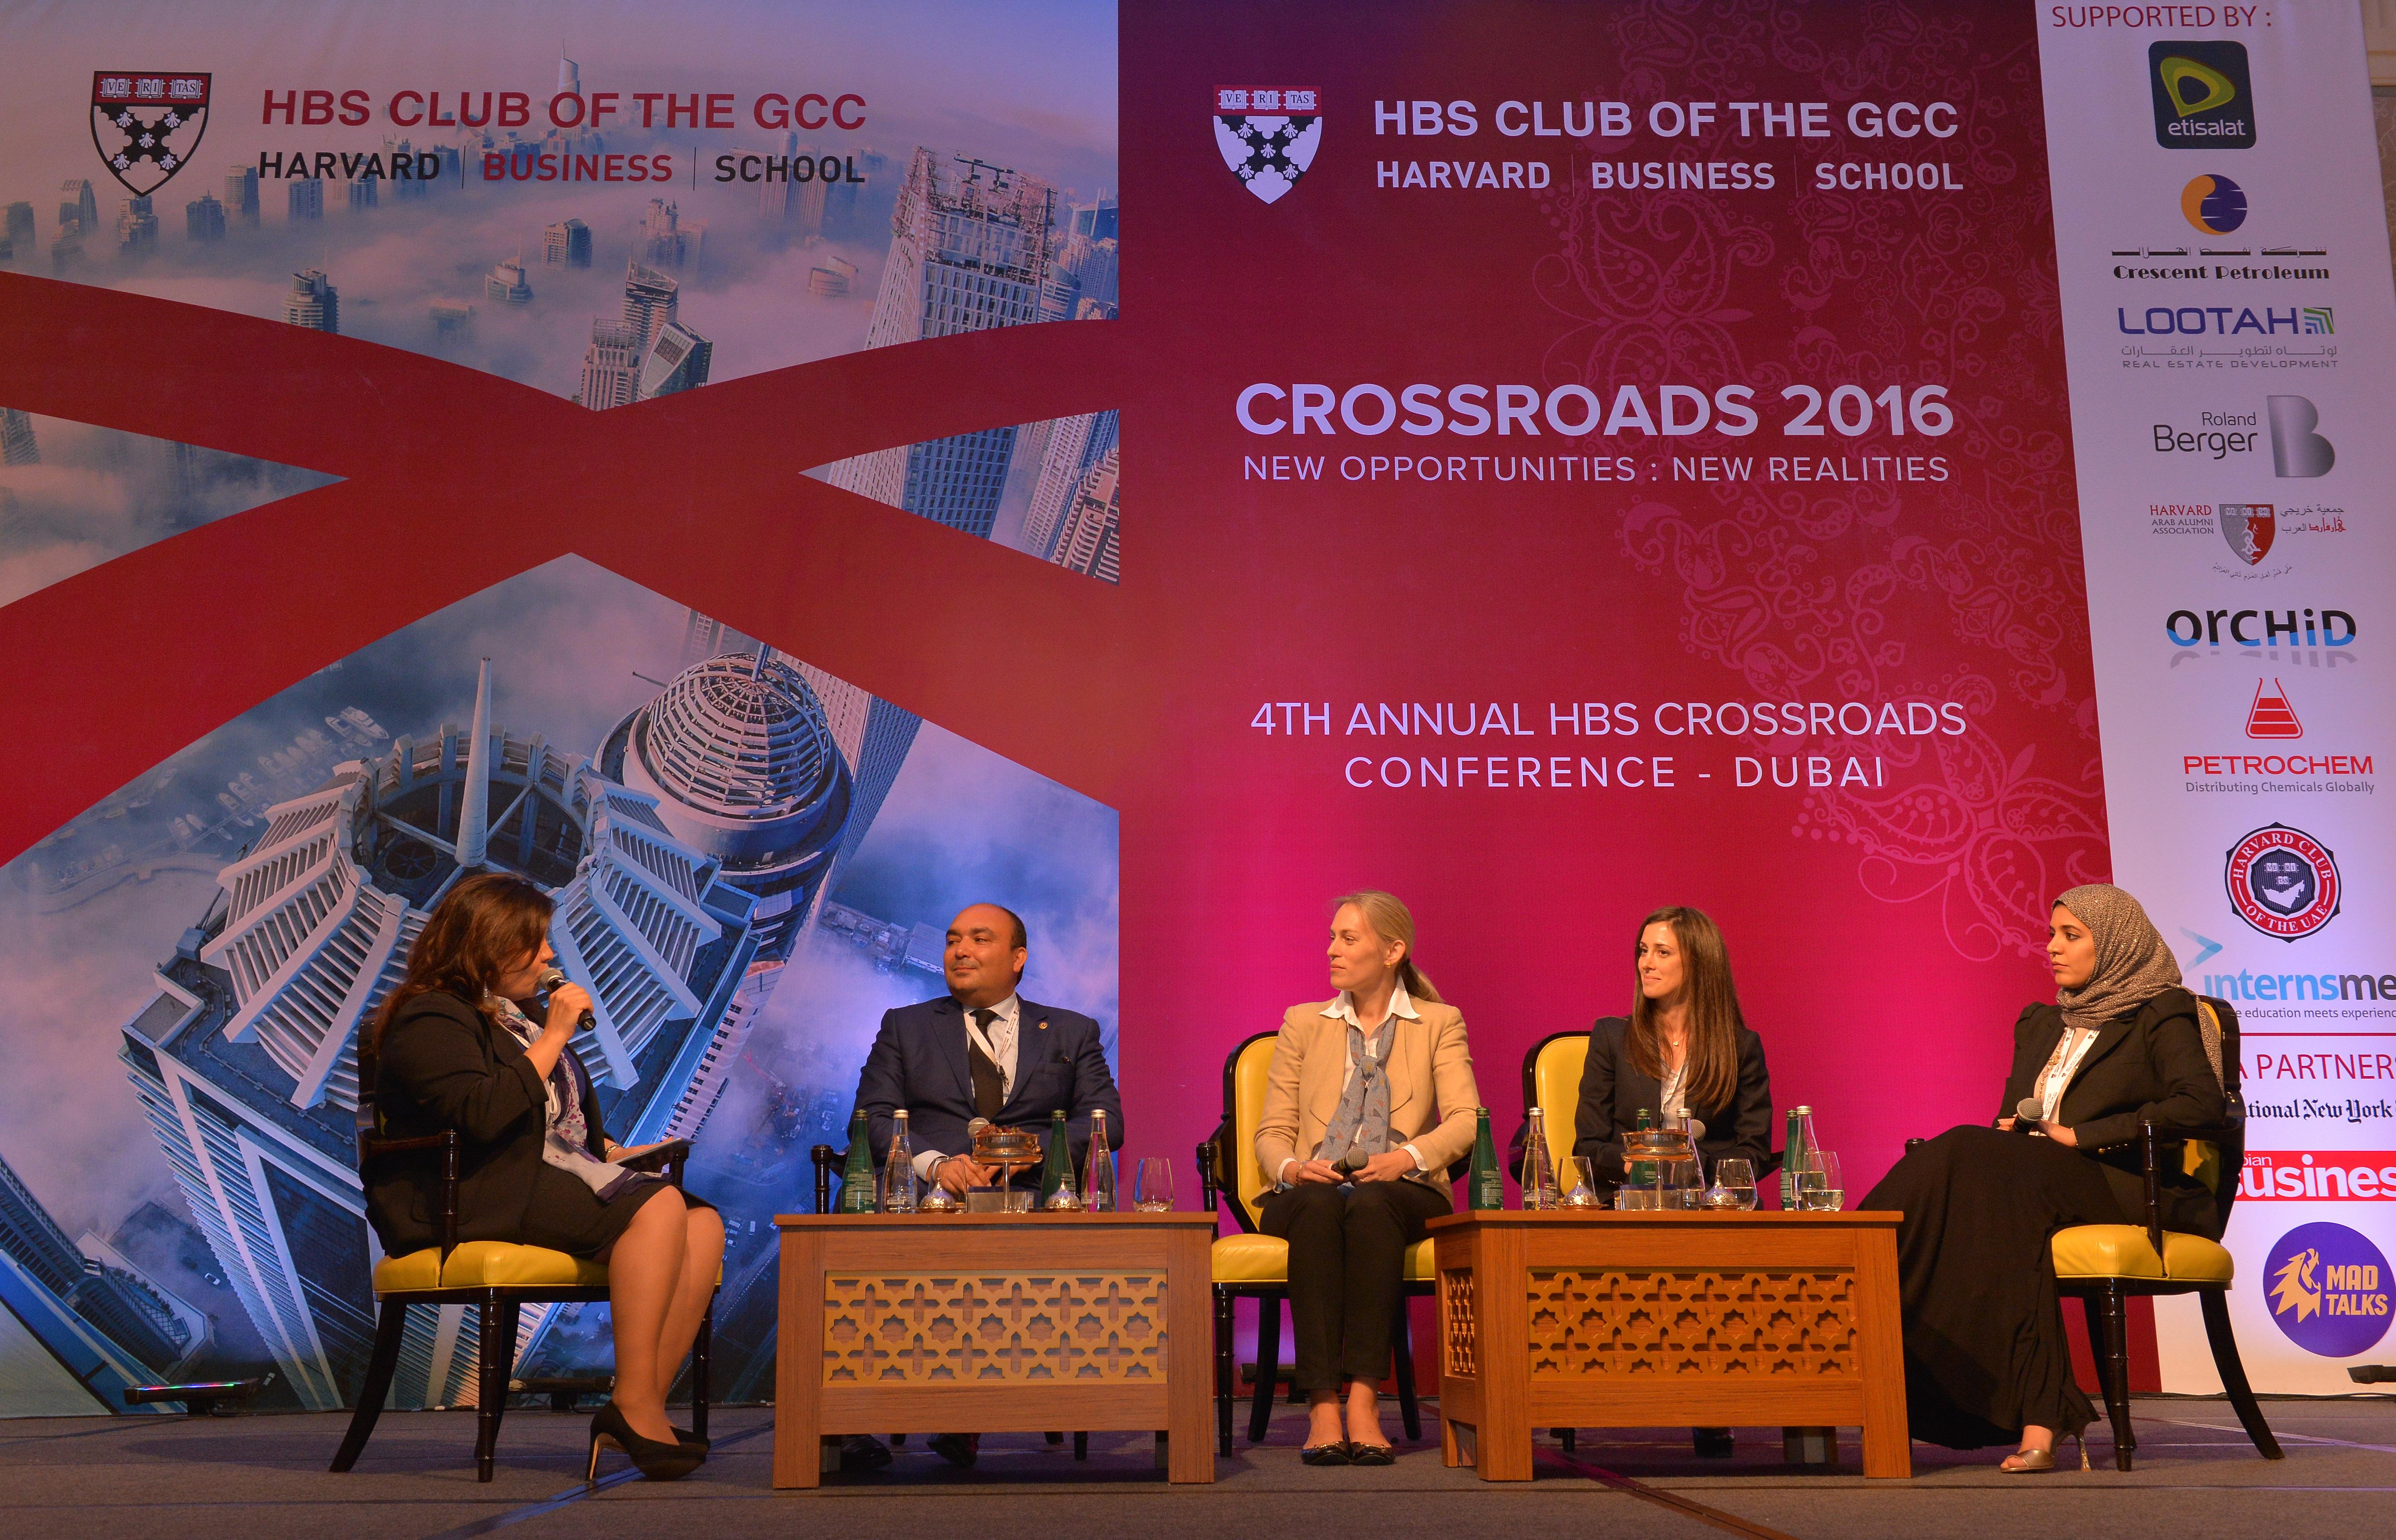 HBS Crossroads 2016